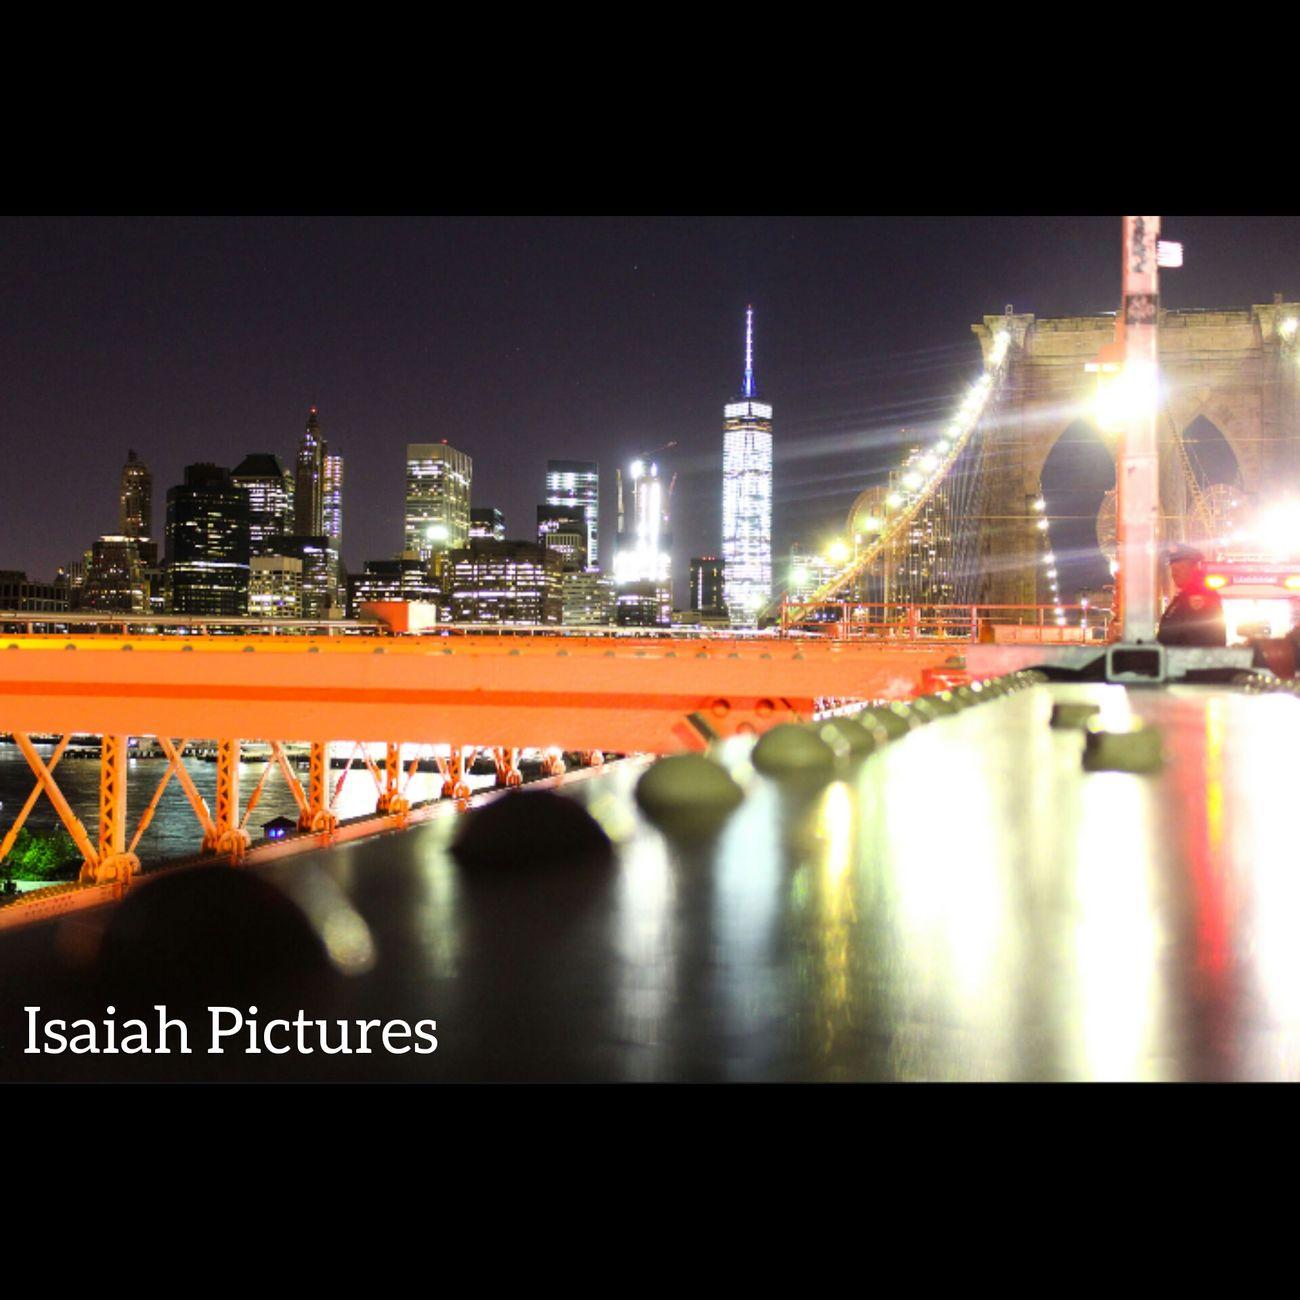 Cities At Night View NYC LIFE ♥ NYCNights EyeEmNyc Nycprimeshot Canonphotography Brooklyn Bridge / New York NYC Skyline Eyeeminstagram